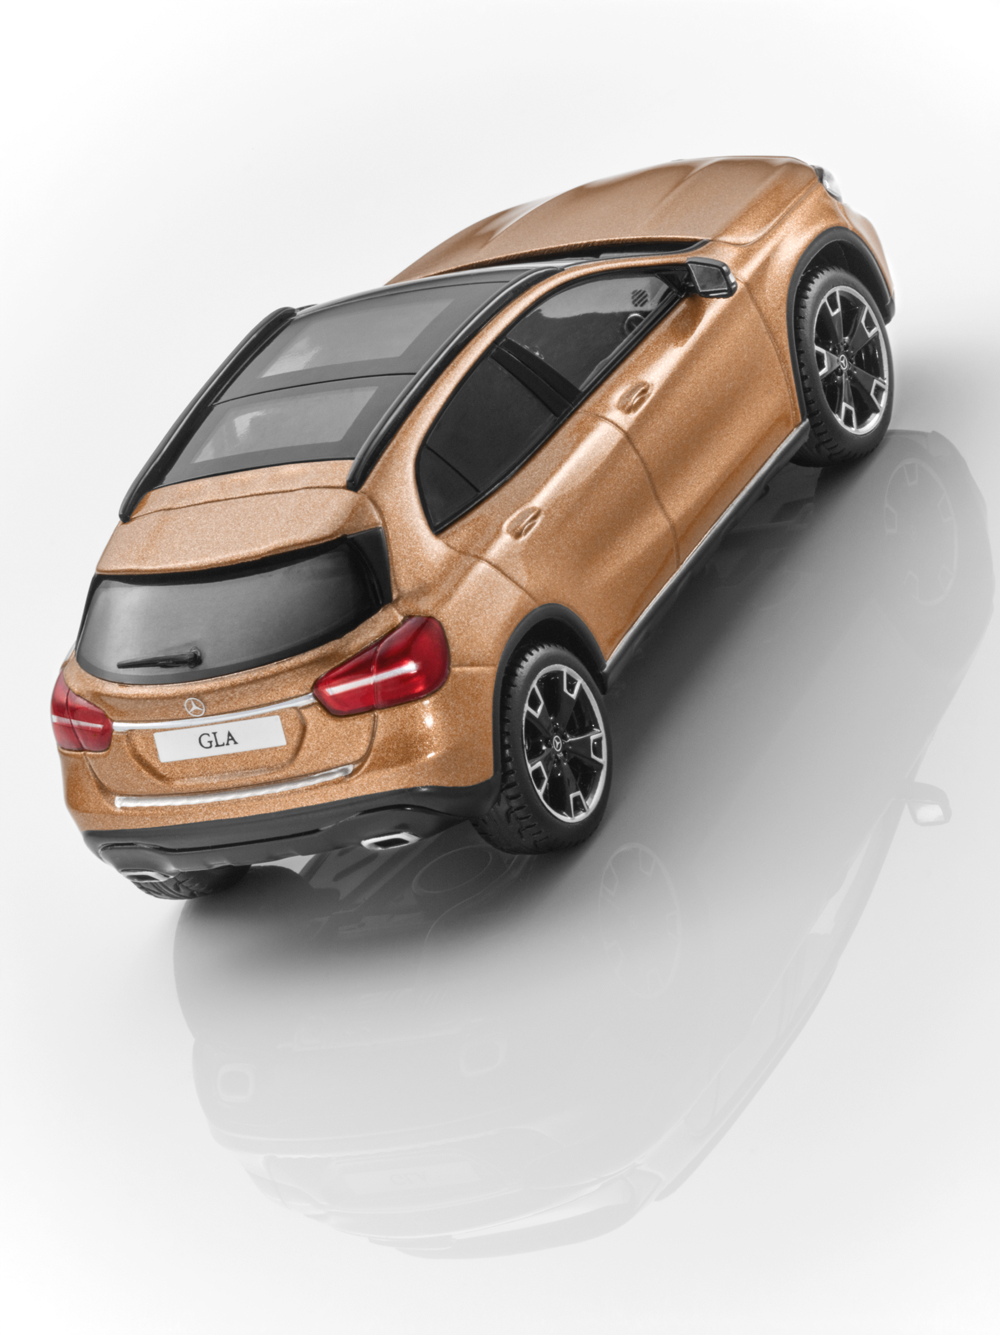 Mercedes Benz X 156 GLA GLA GLA Facelift 2017 marron 1 43 Nouveau neuf dans sa boîte c7daeb